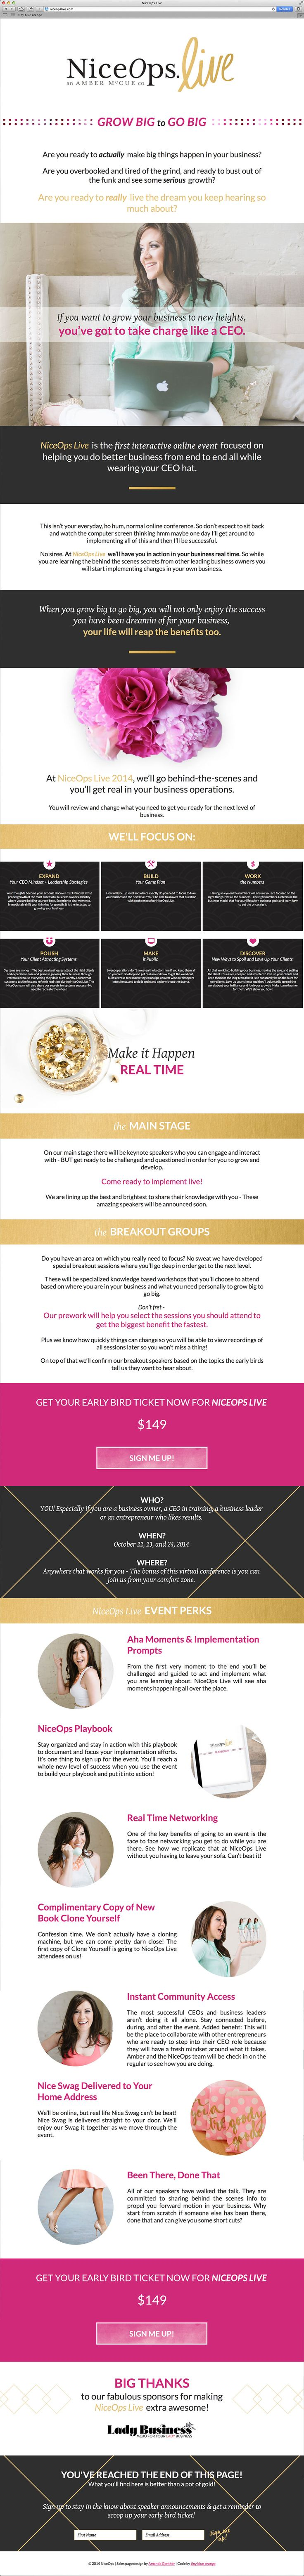 You go, Amber McCue! Gorgeous sales page design for entrepreneurs and e-courses, digital programs.